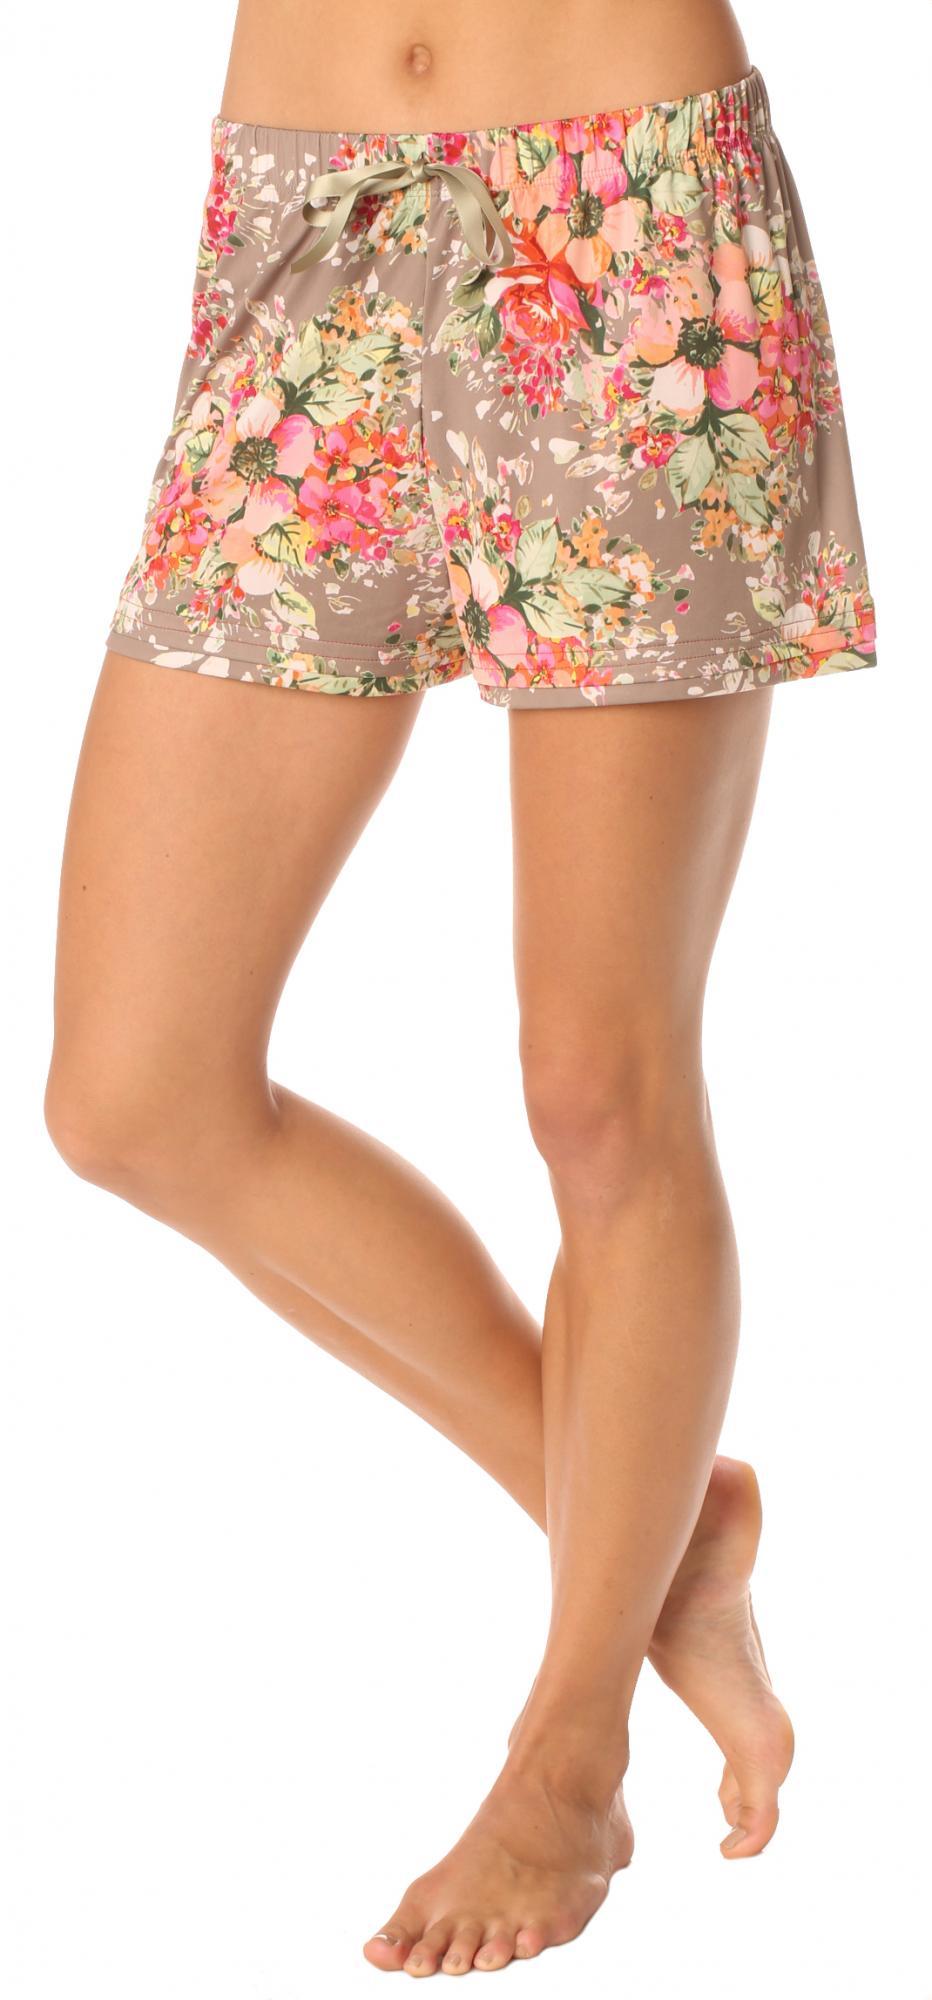 majamas-sunrise-nursing-boxer-set-oasis-shorts.jpg